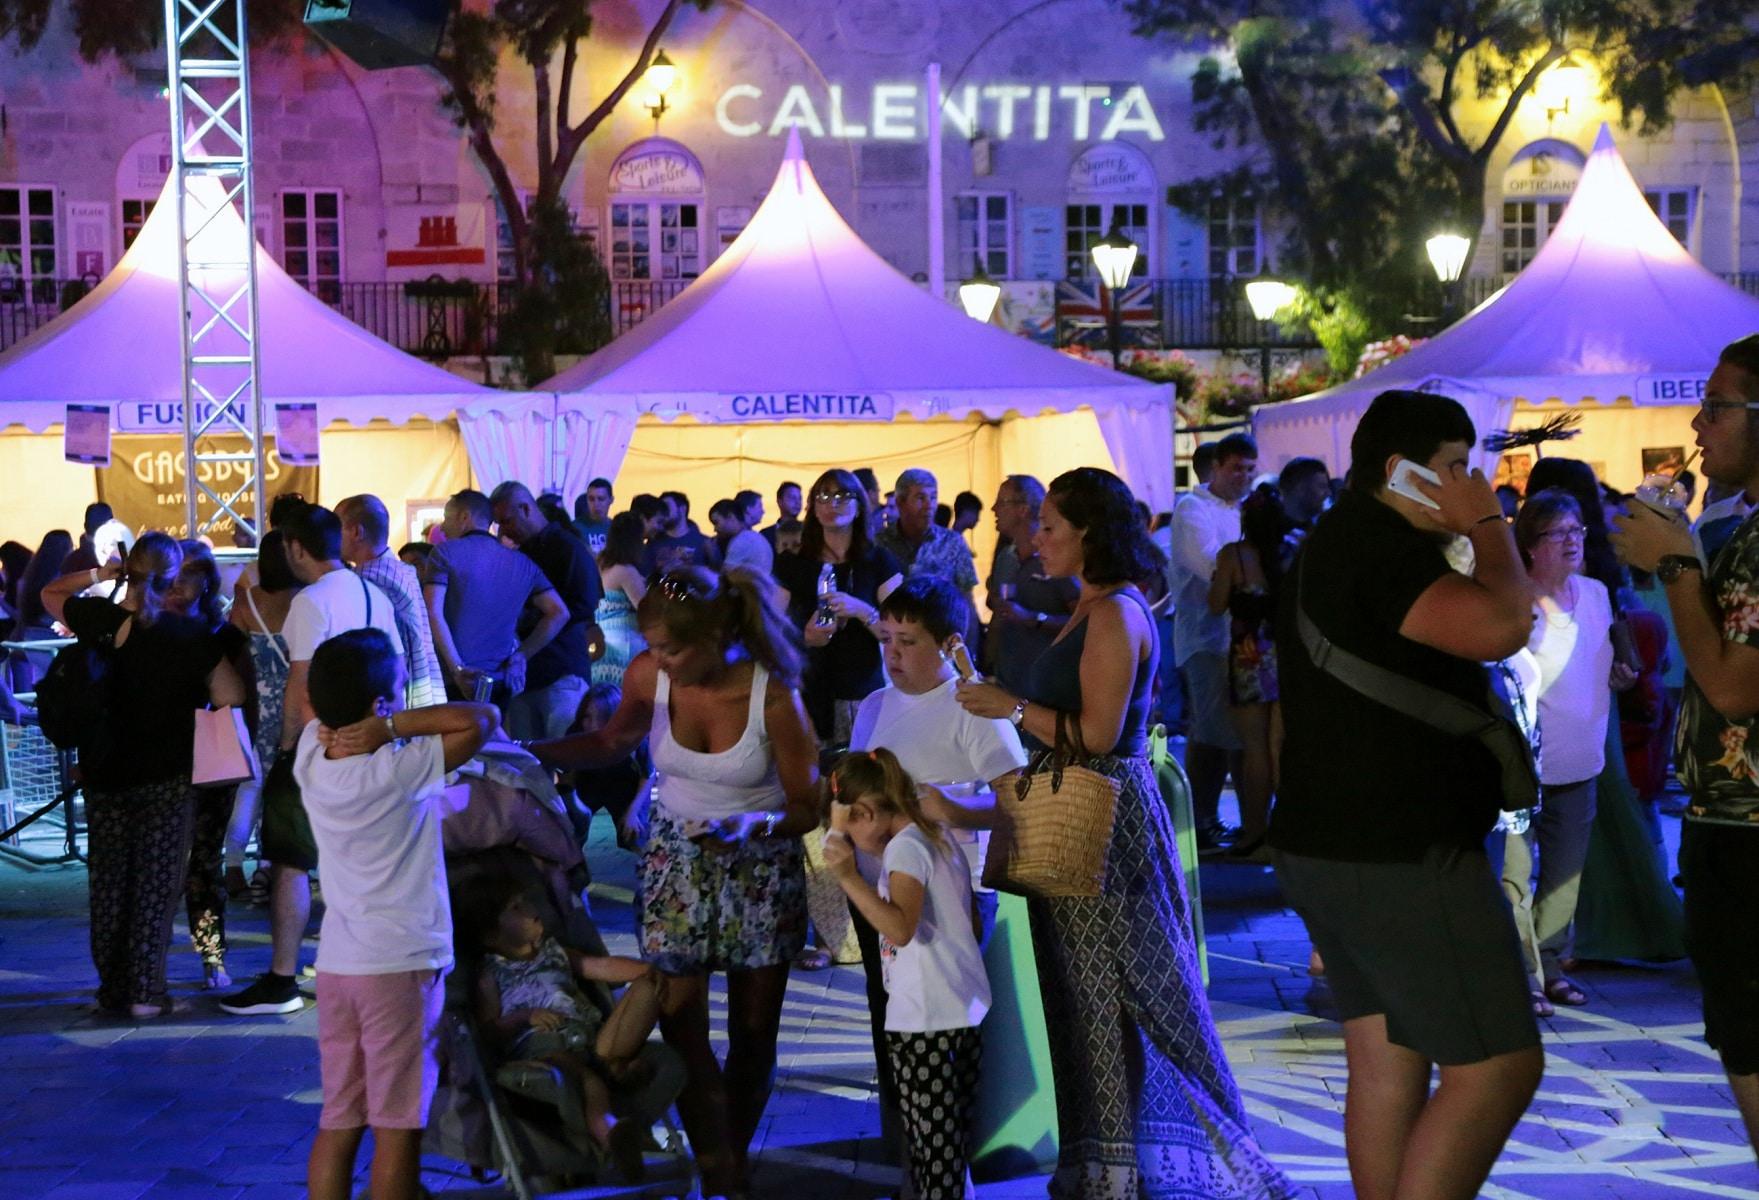 18-jun-2016-noche-de-la-calentita-en-gibraltar_27221948144_o